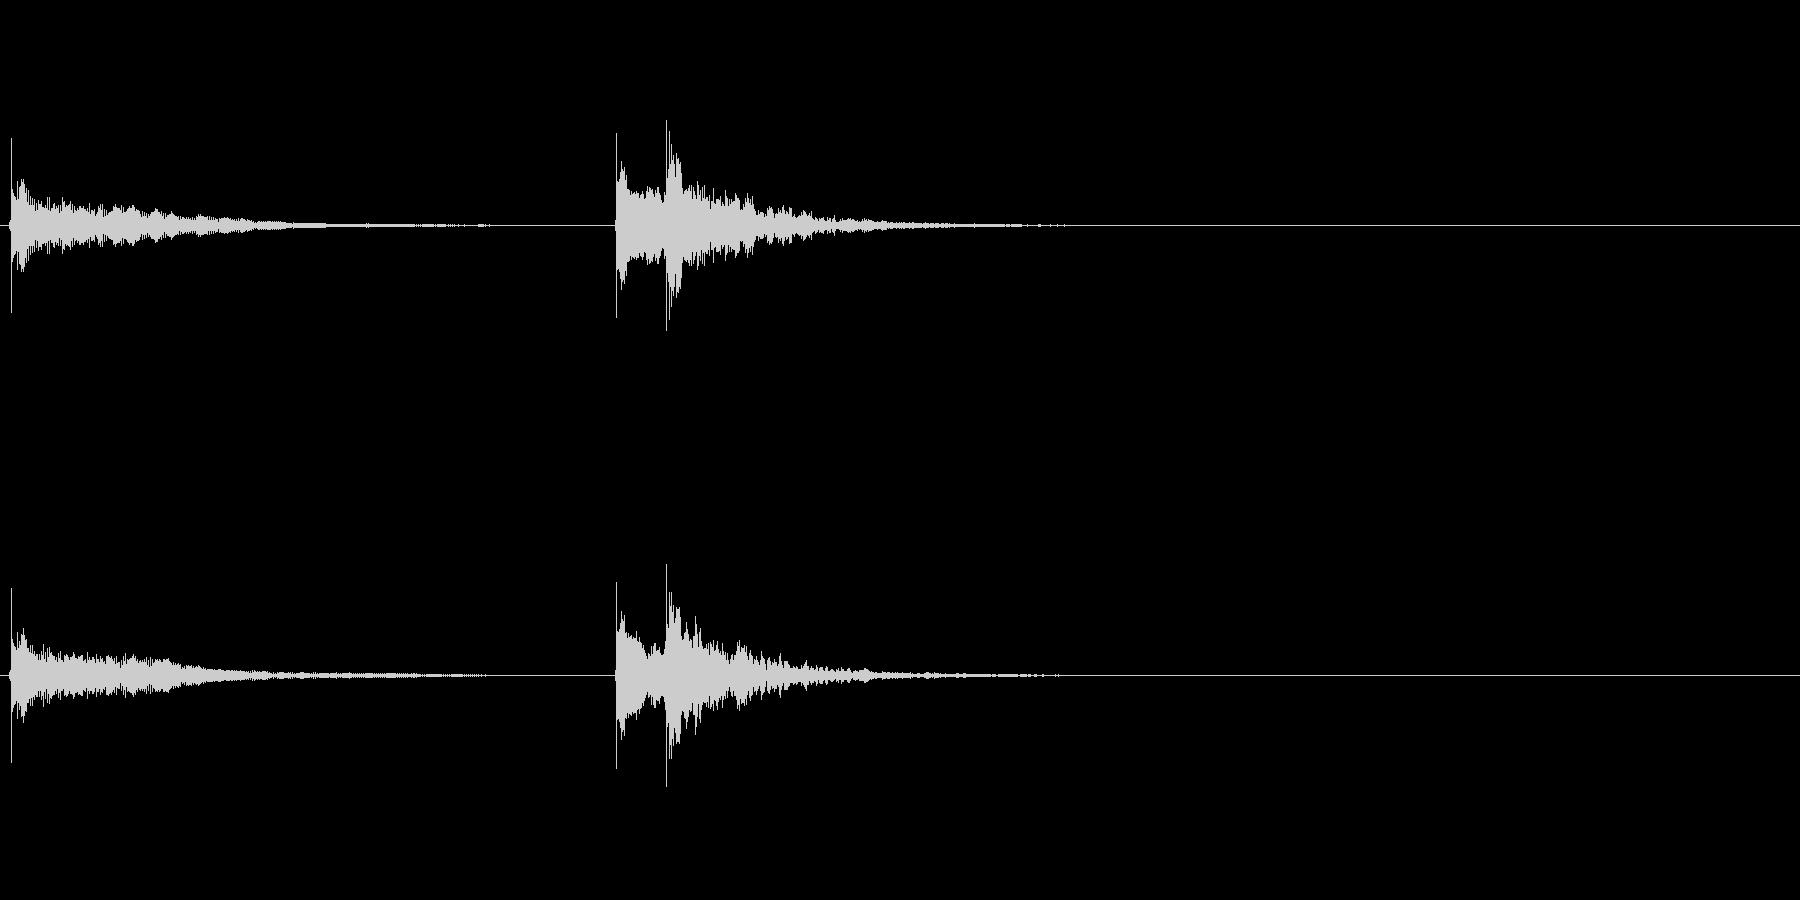 生演奏 琵琶 和風 古典風 残響有#5の未再生の波形